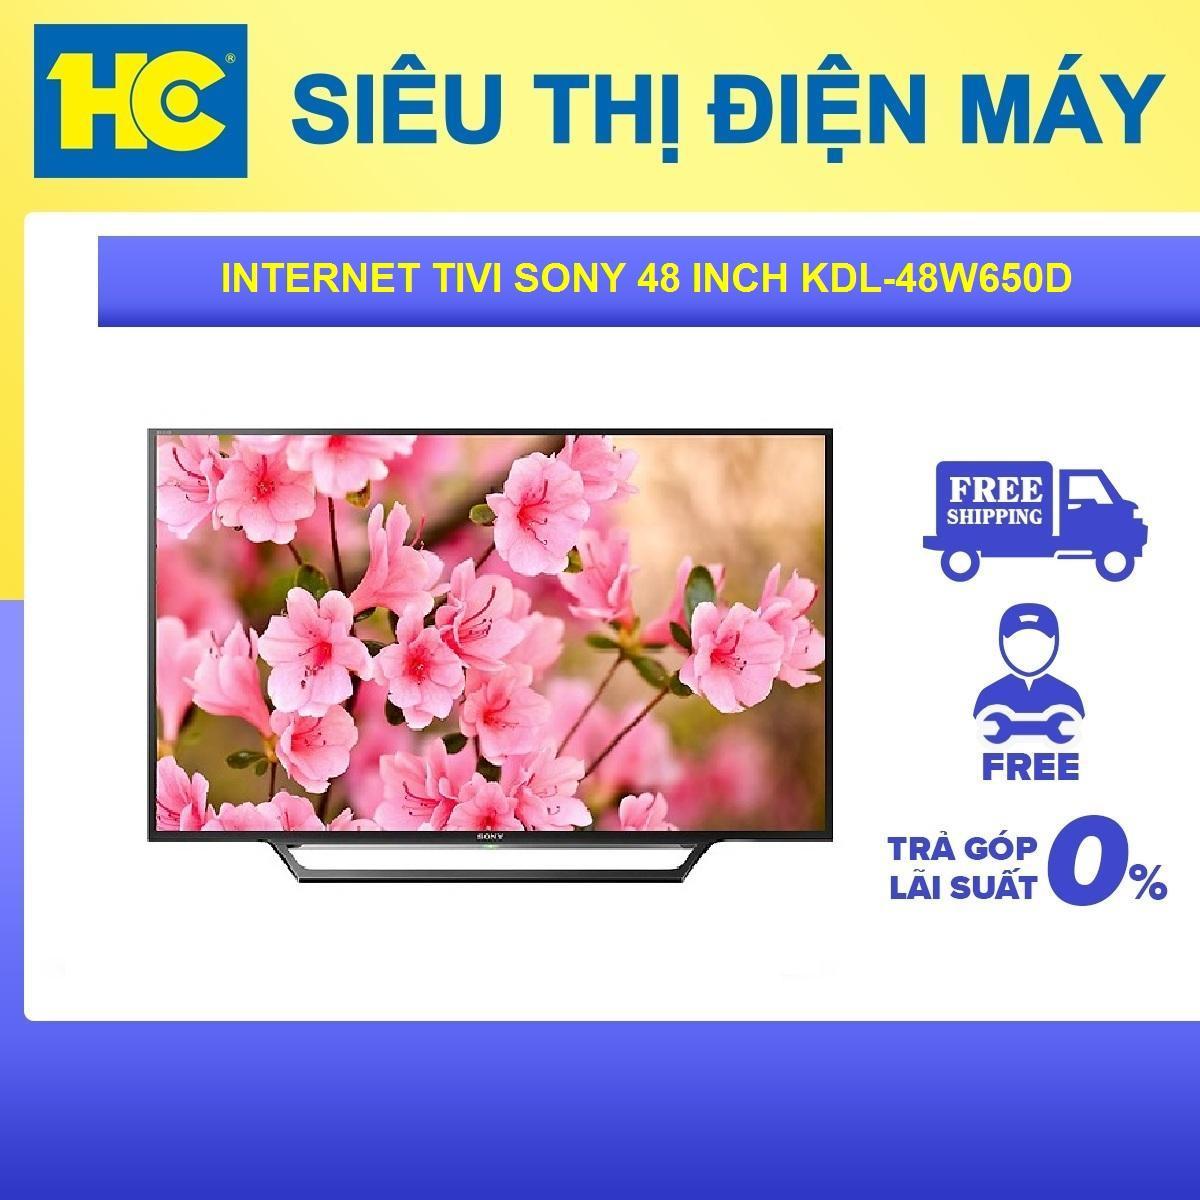 Bảng giá Internet Tivi Sony 48 inch KDL-48W650D